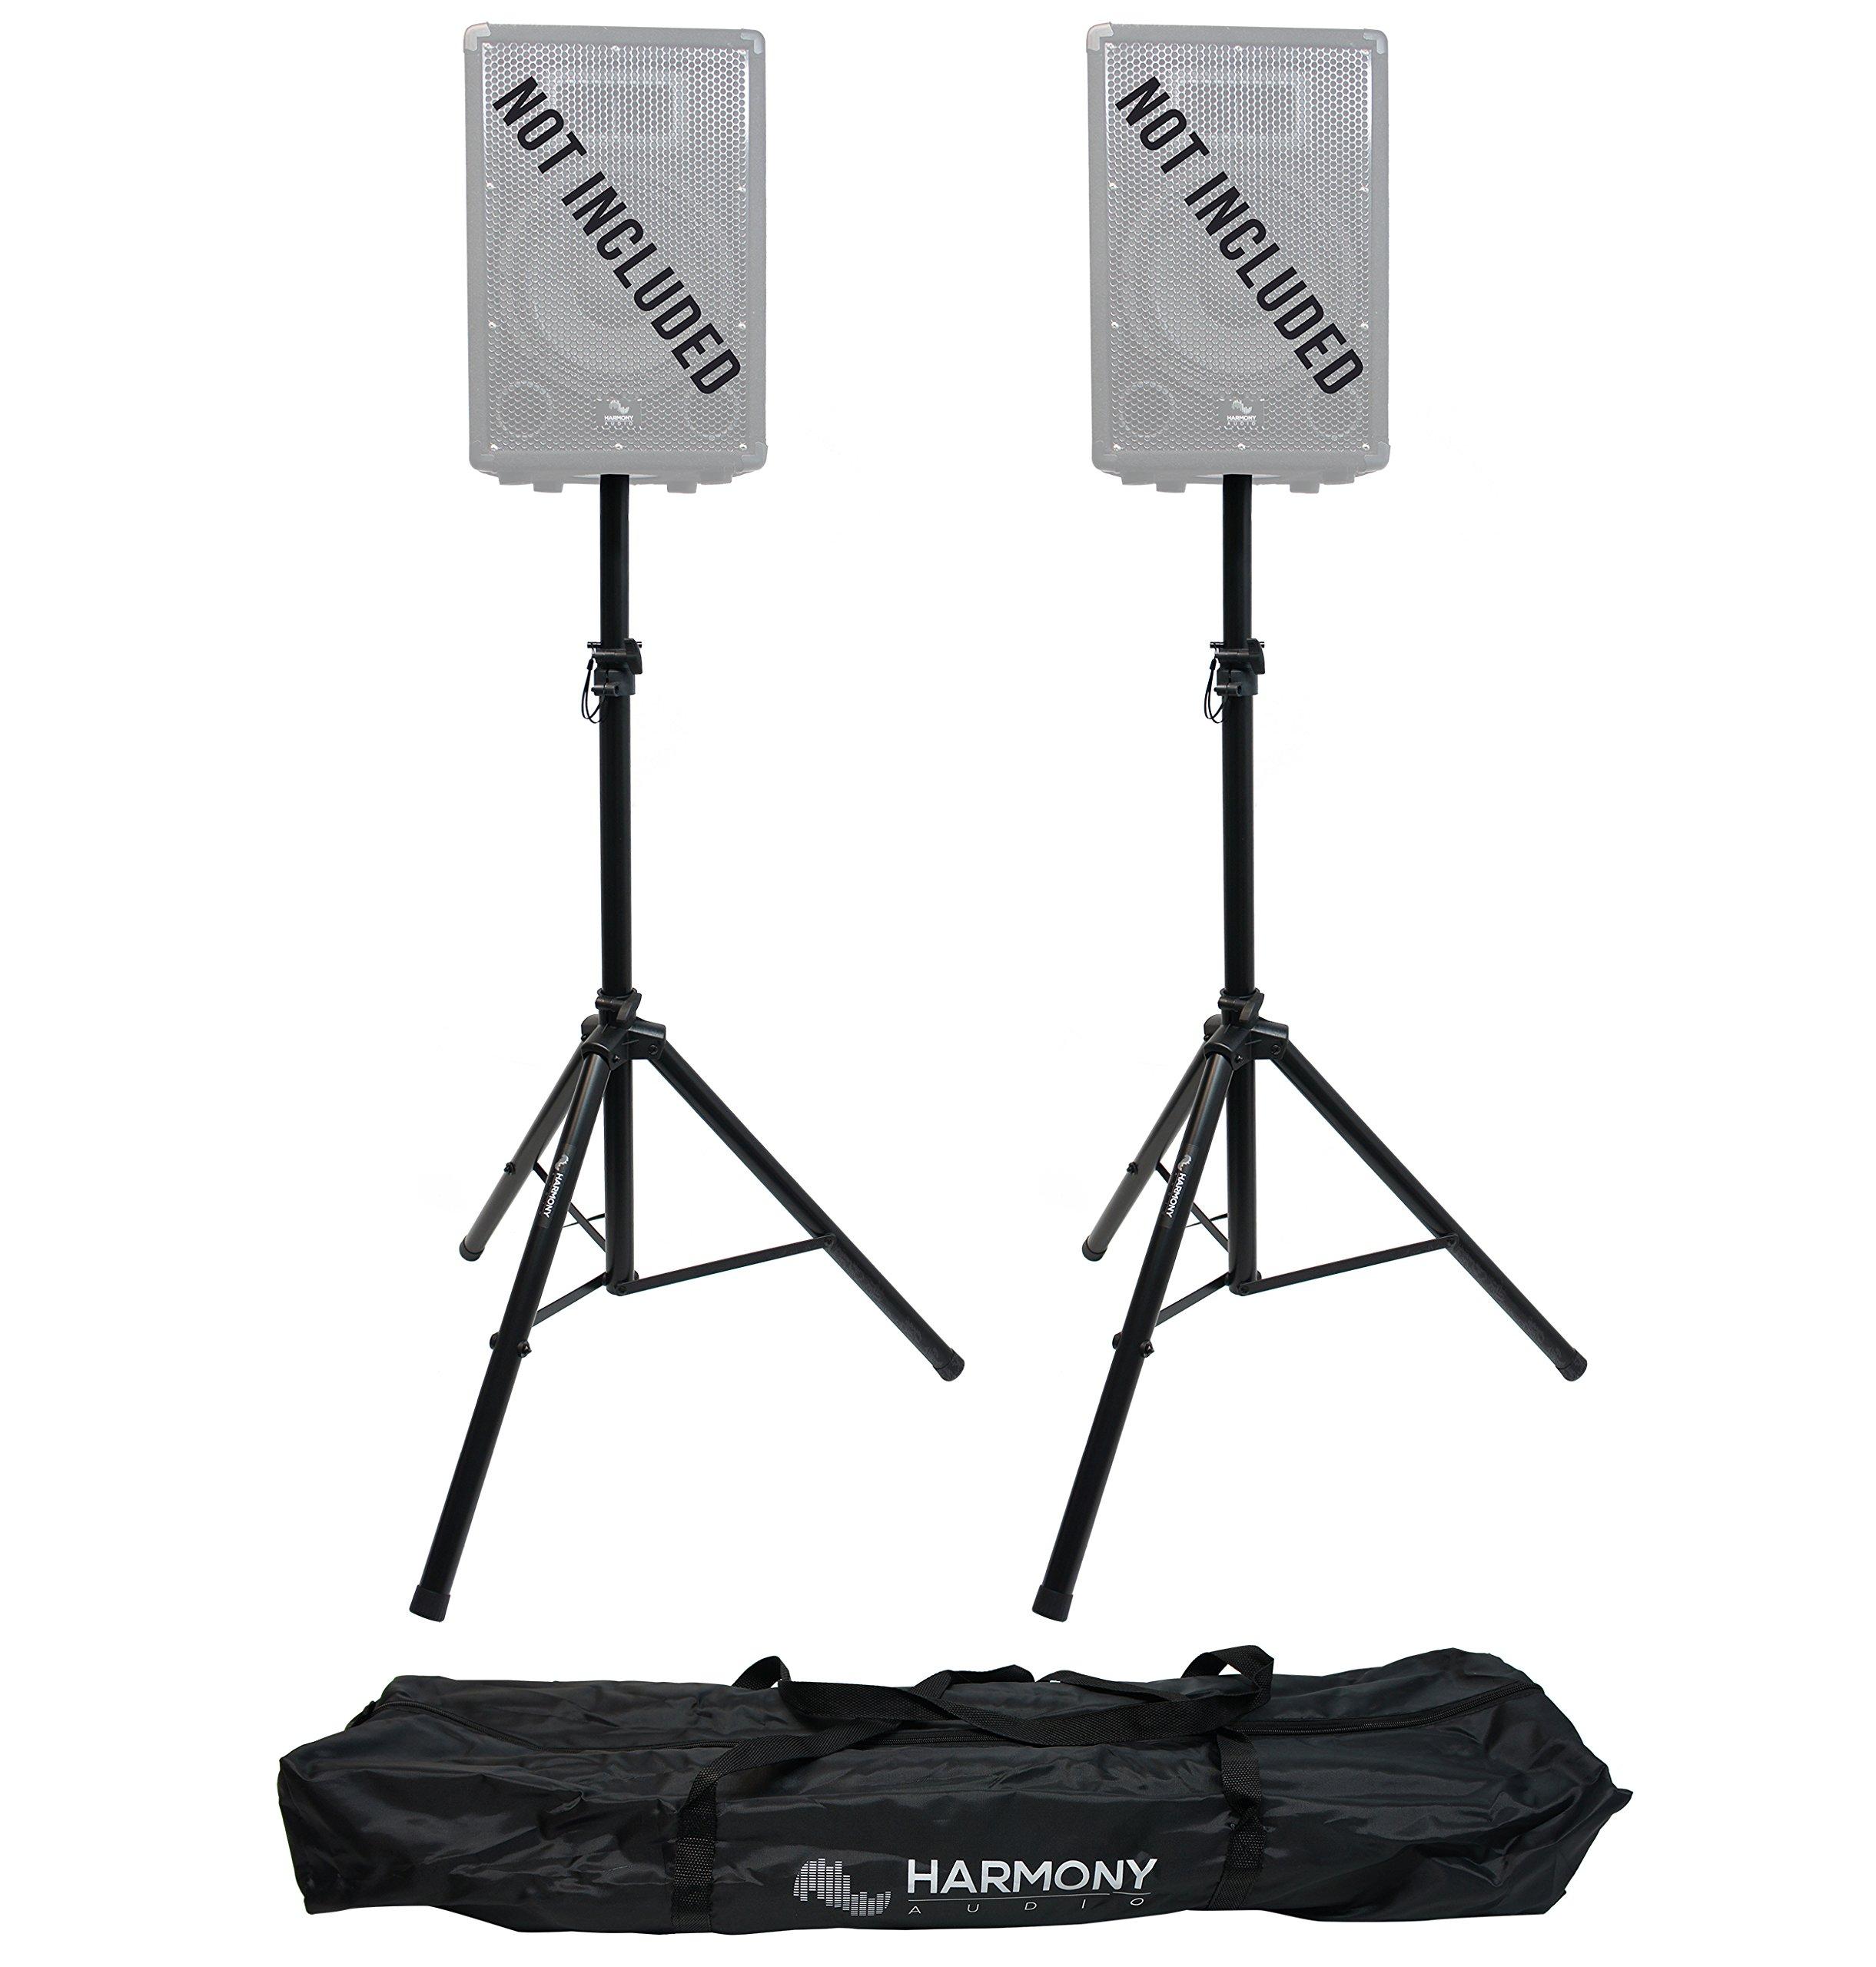 Harmony Audio HA-DSBG Pro Audio DJ (2) Portable Tripod Speaker Stand Pair & Transport Bag